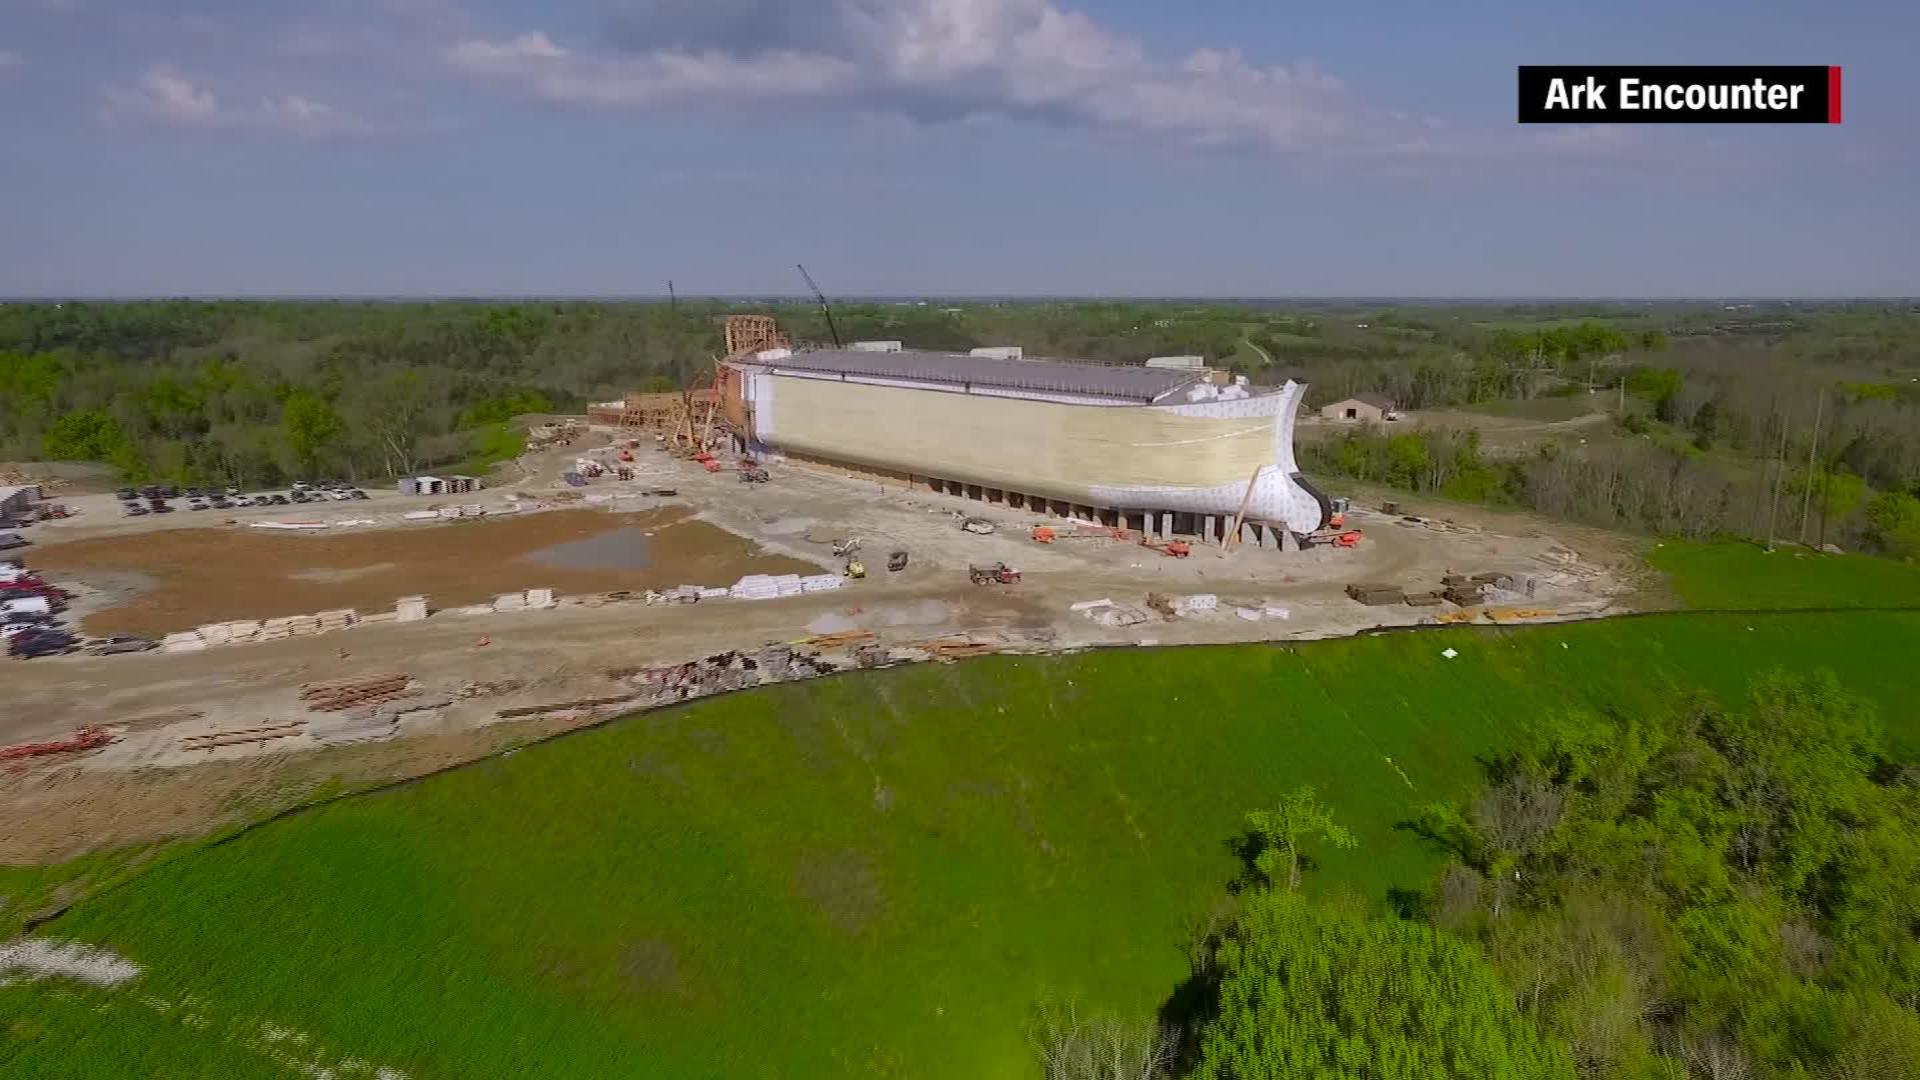 Full-scale Noah's Ark being built in Kentucky - CNN Video